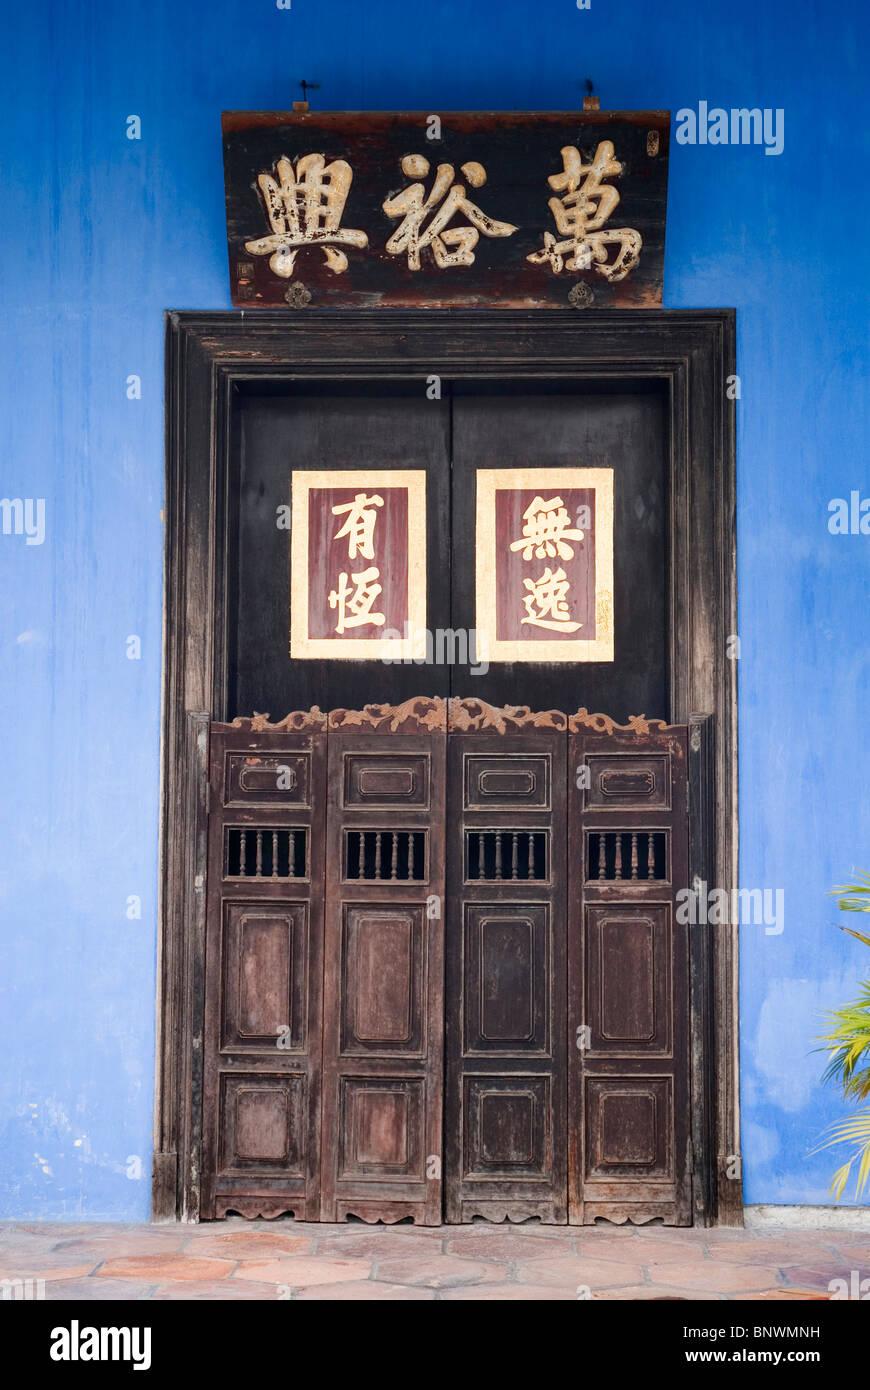 Puerta de script en Chino Chong Fatt Tze Mansion Imagen De Stock